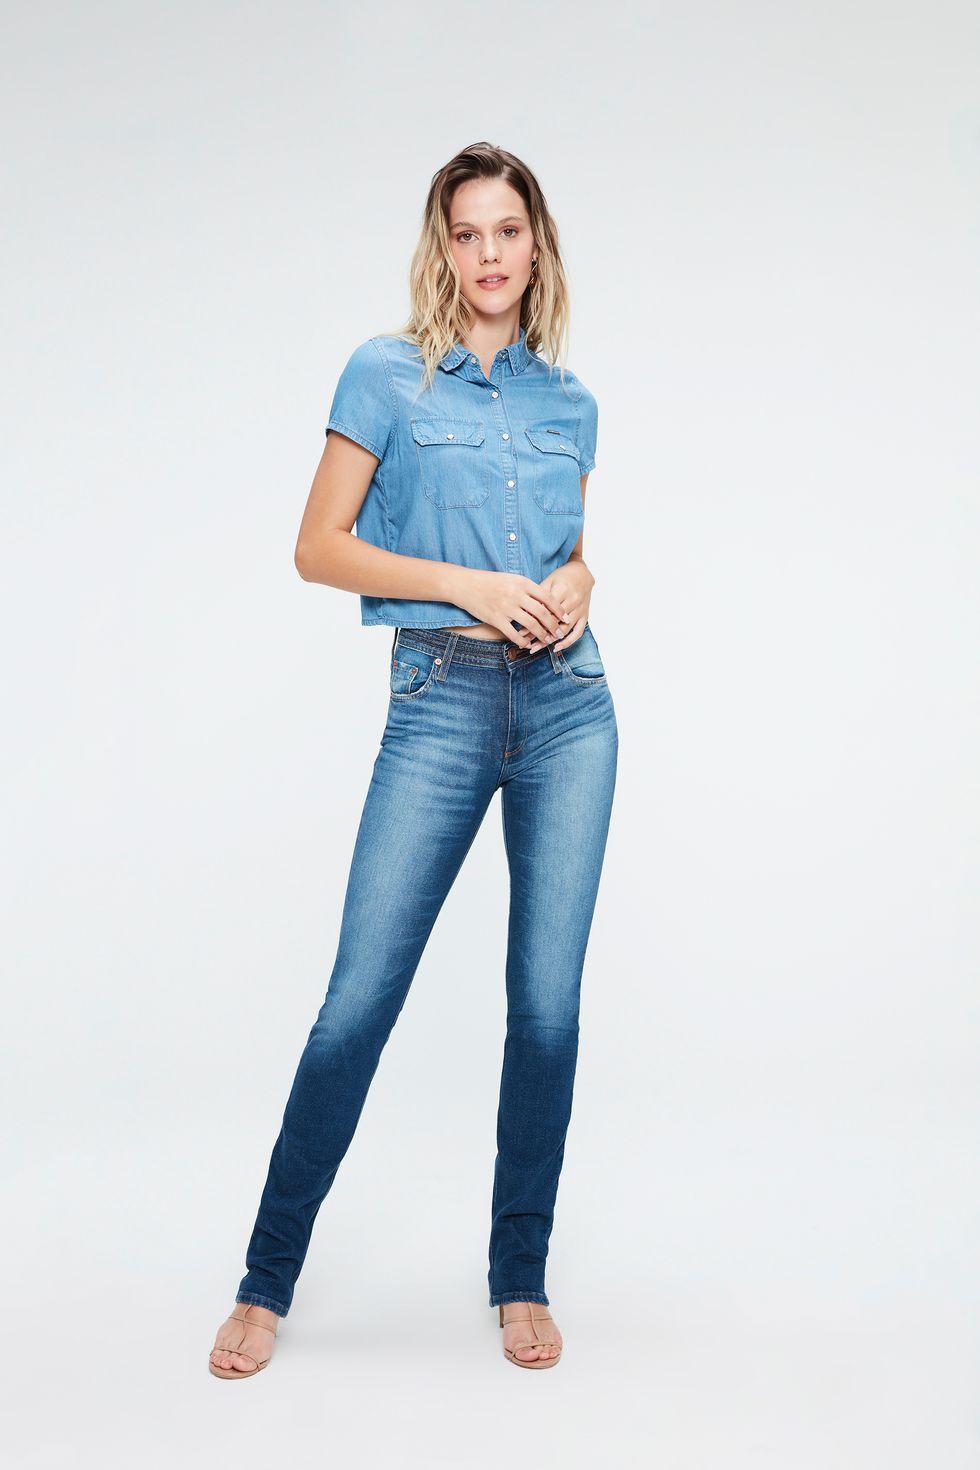 Calça Jeans Reta Feminina Tam: 40 / Cor: MEDIA